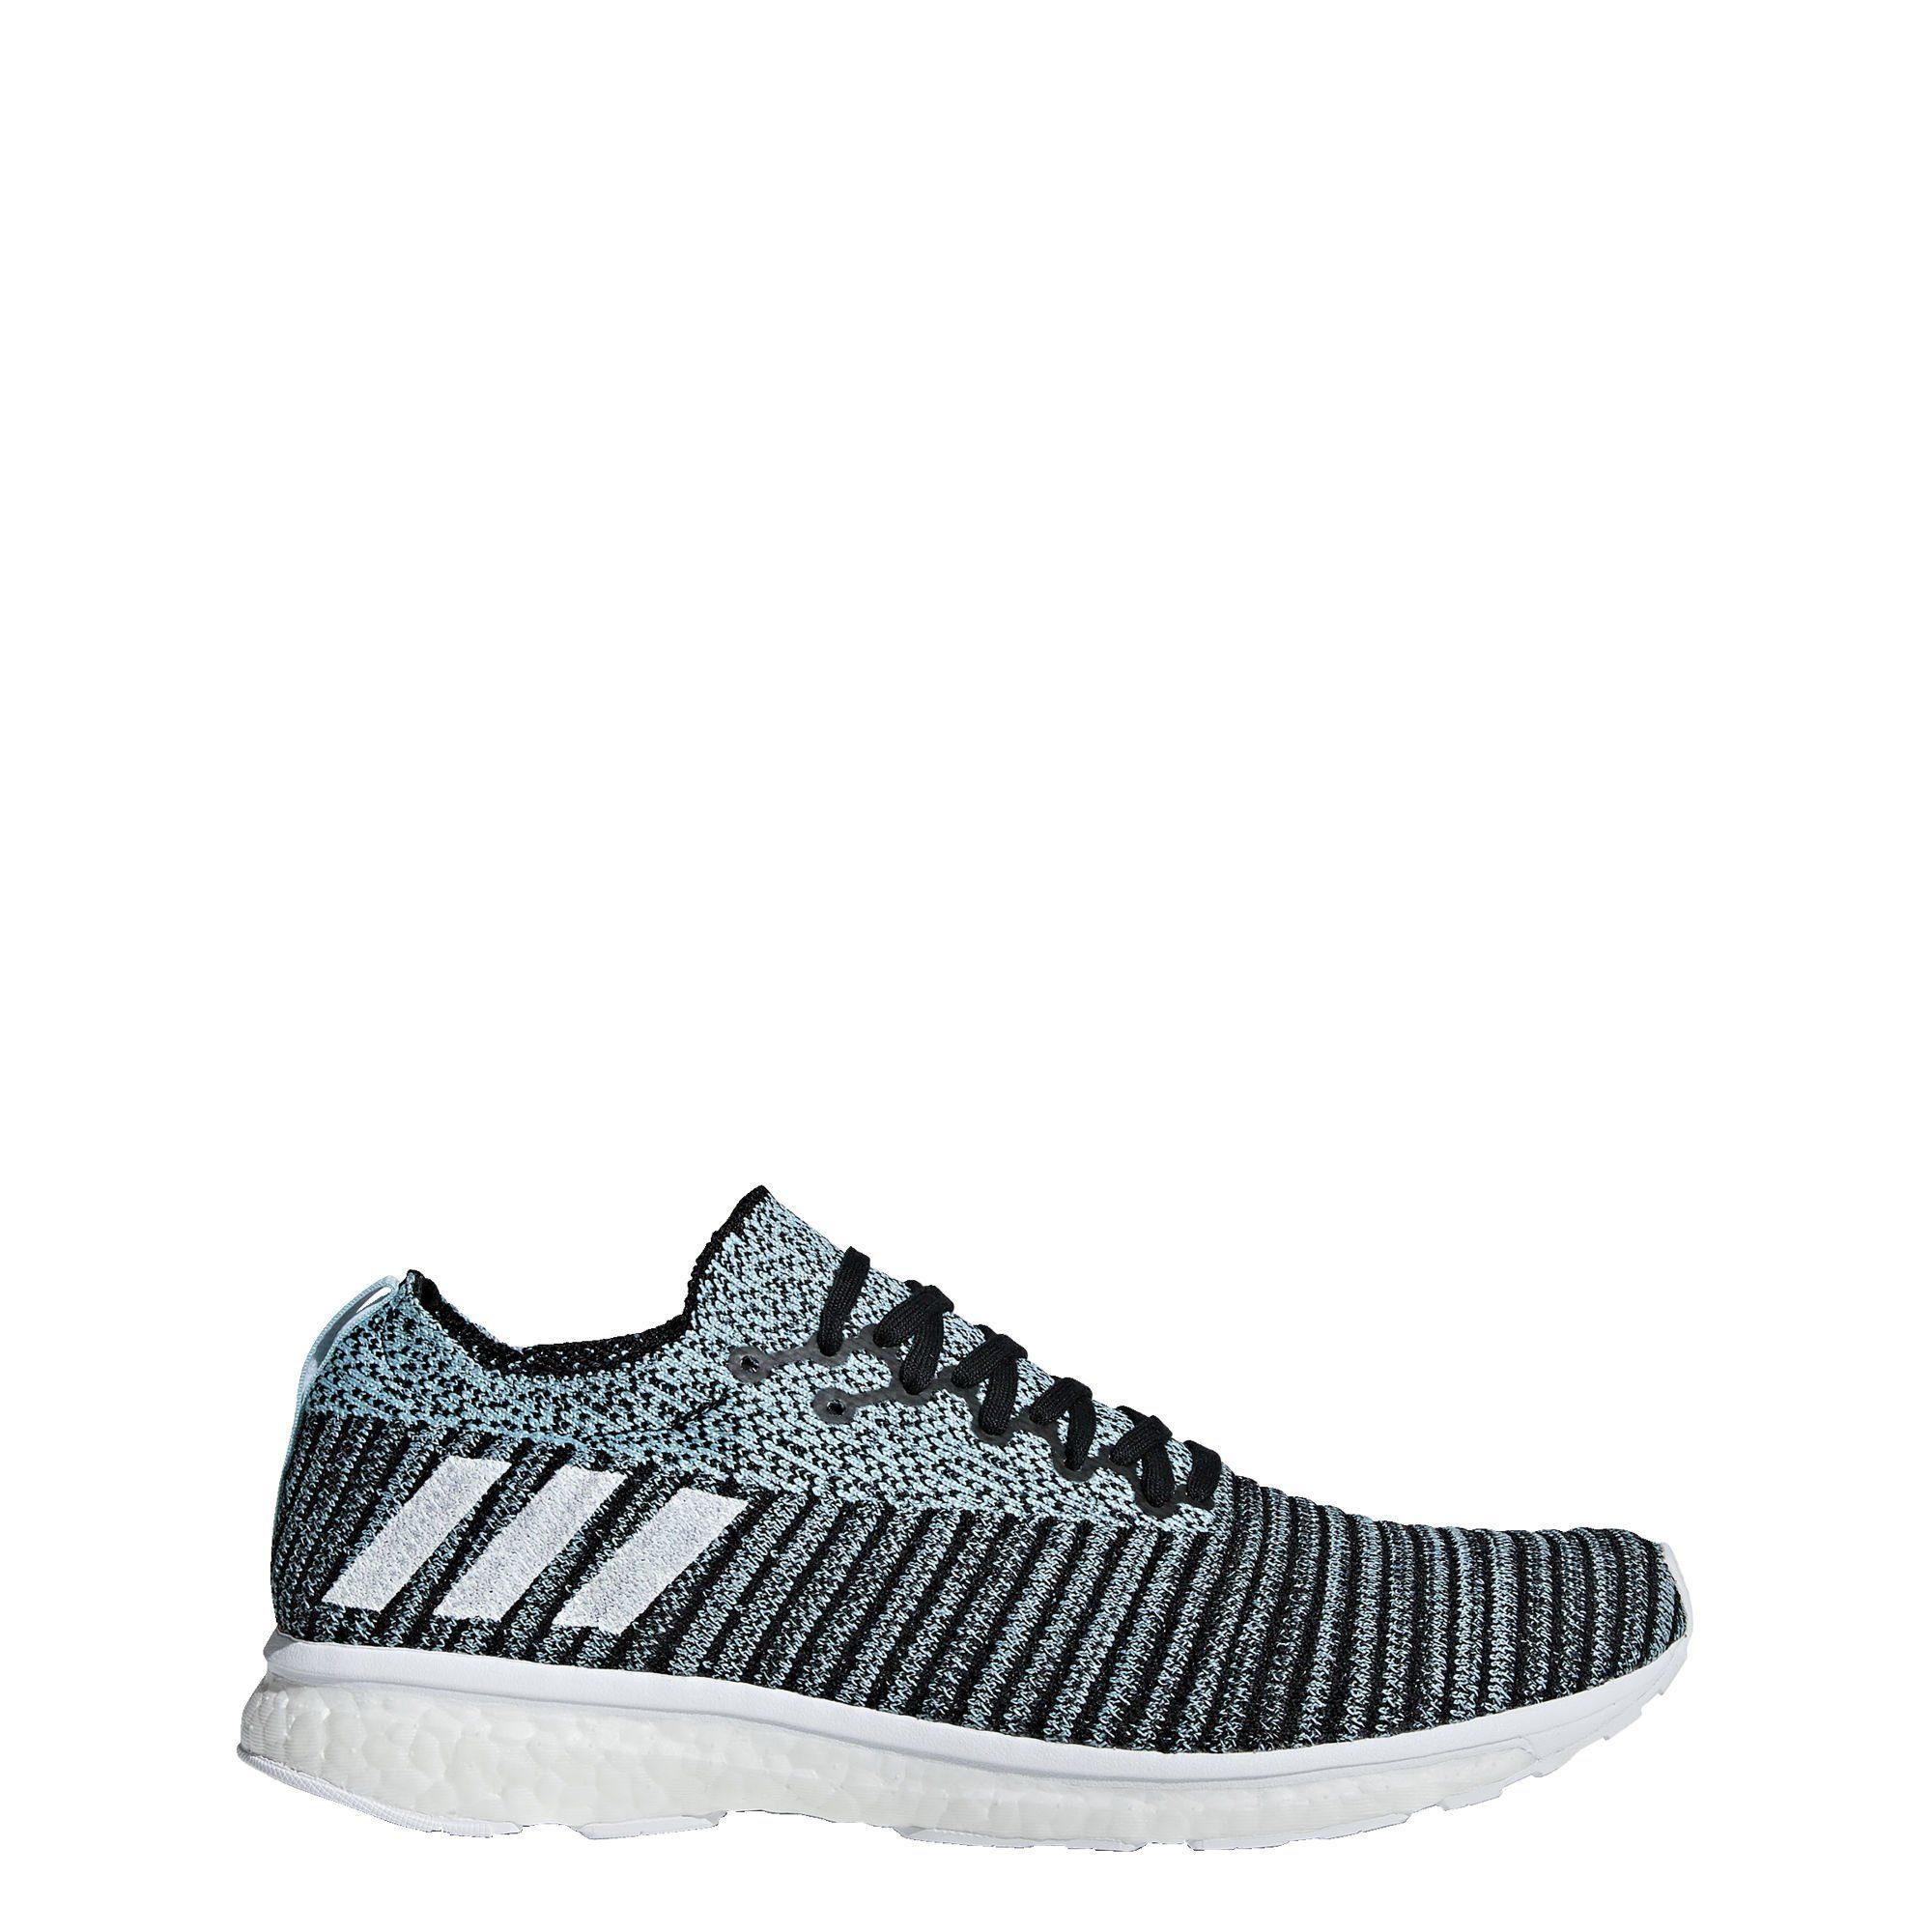 Laufschuh Online KaufenOtto Adizero Adidas Ltd Performance »adizero Prime Schuh« nmN08wvO